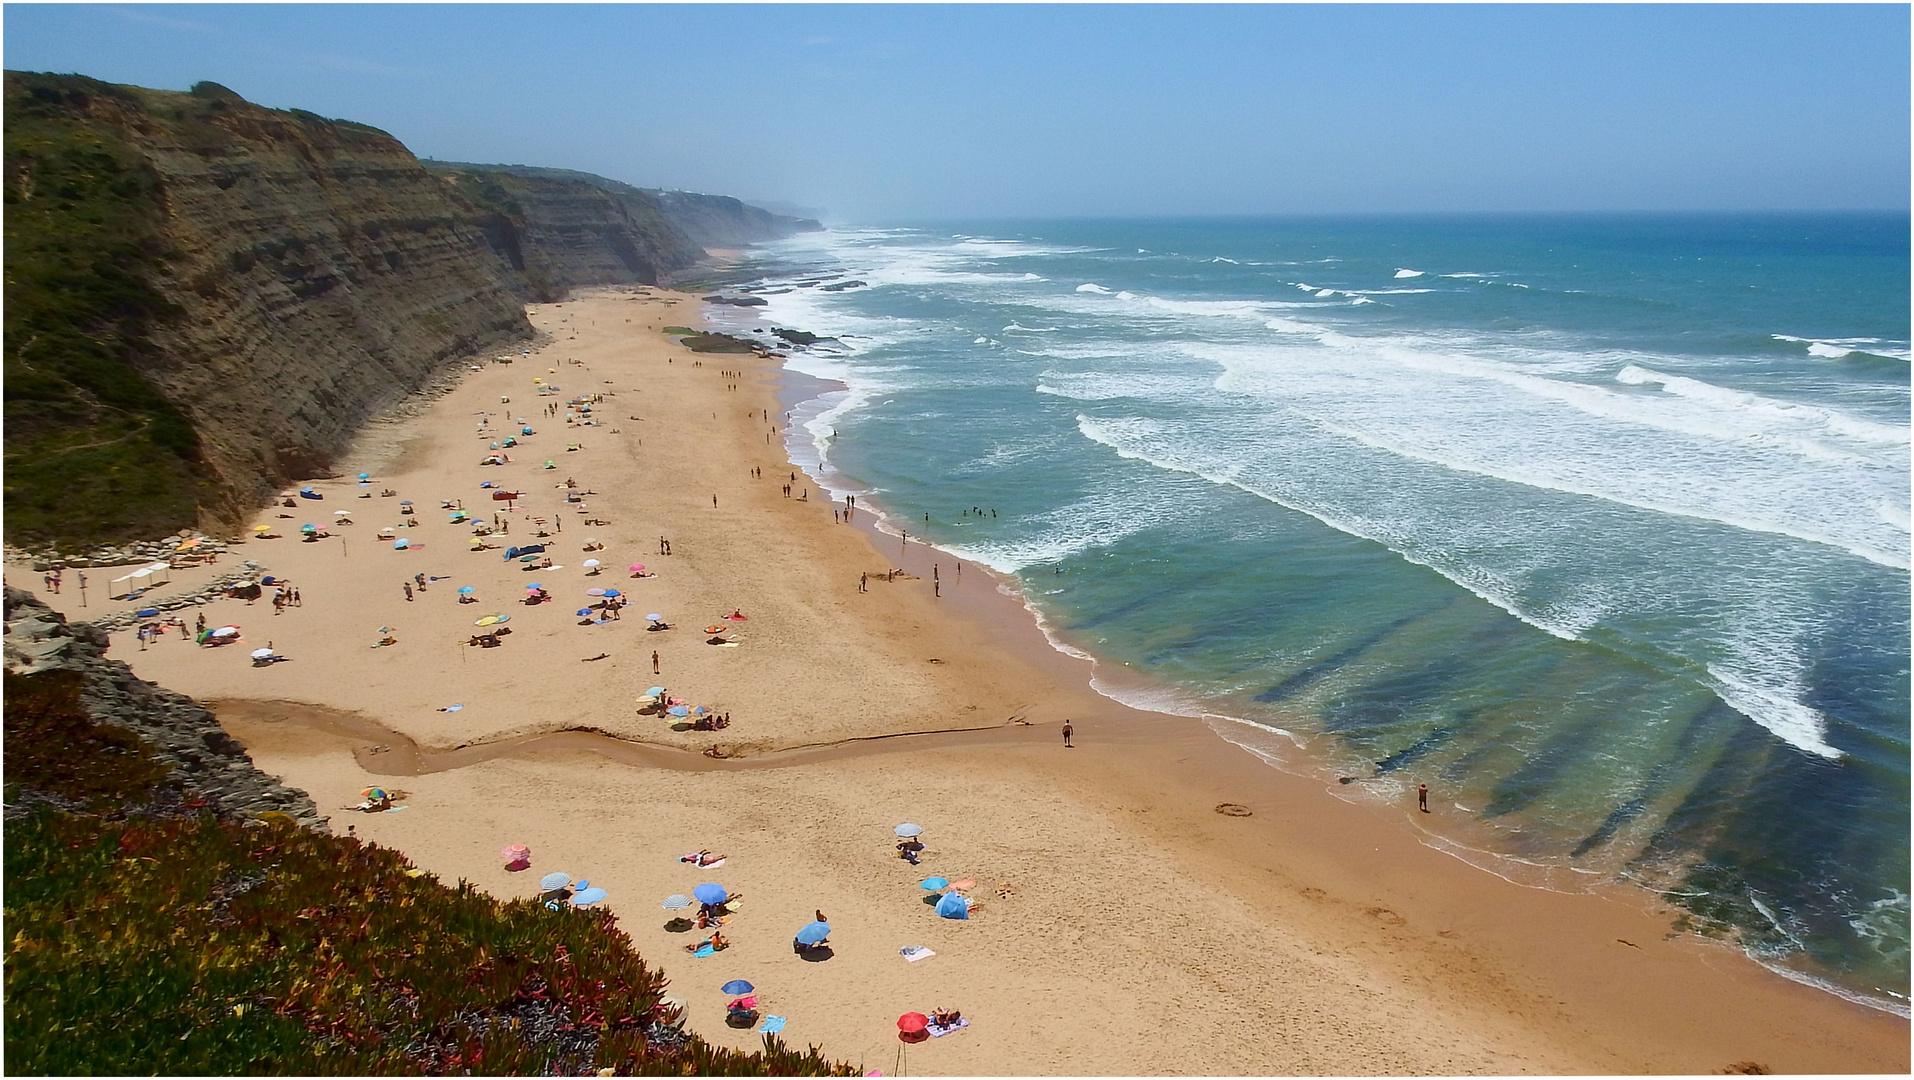 South part of Magoito beach.